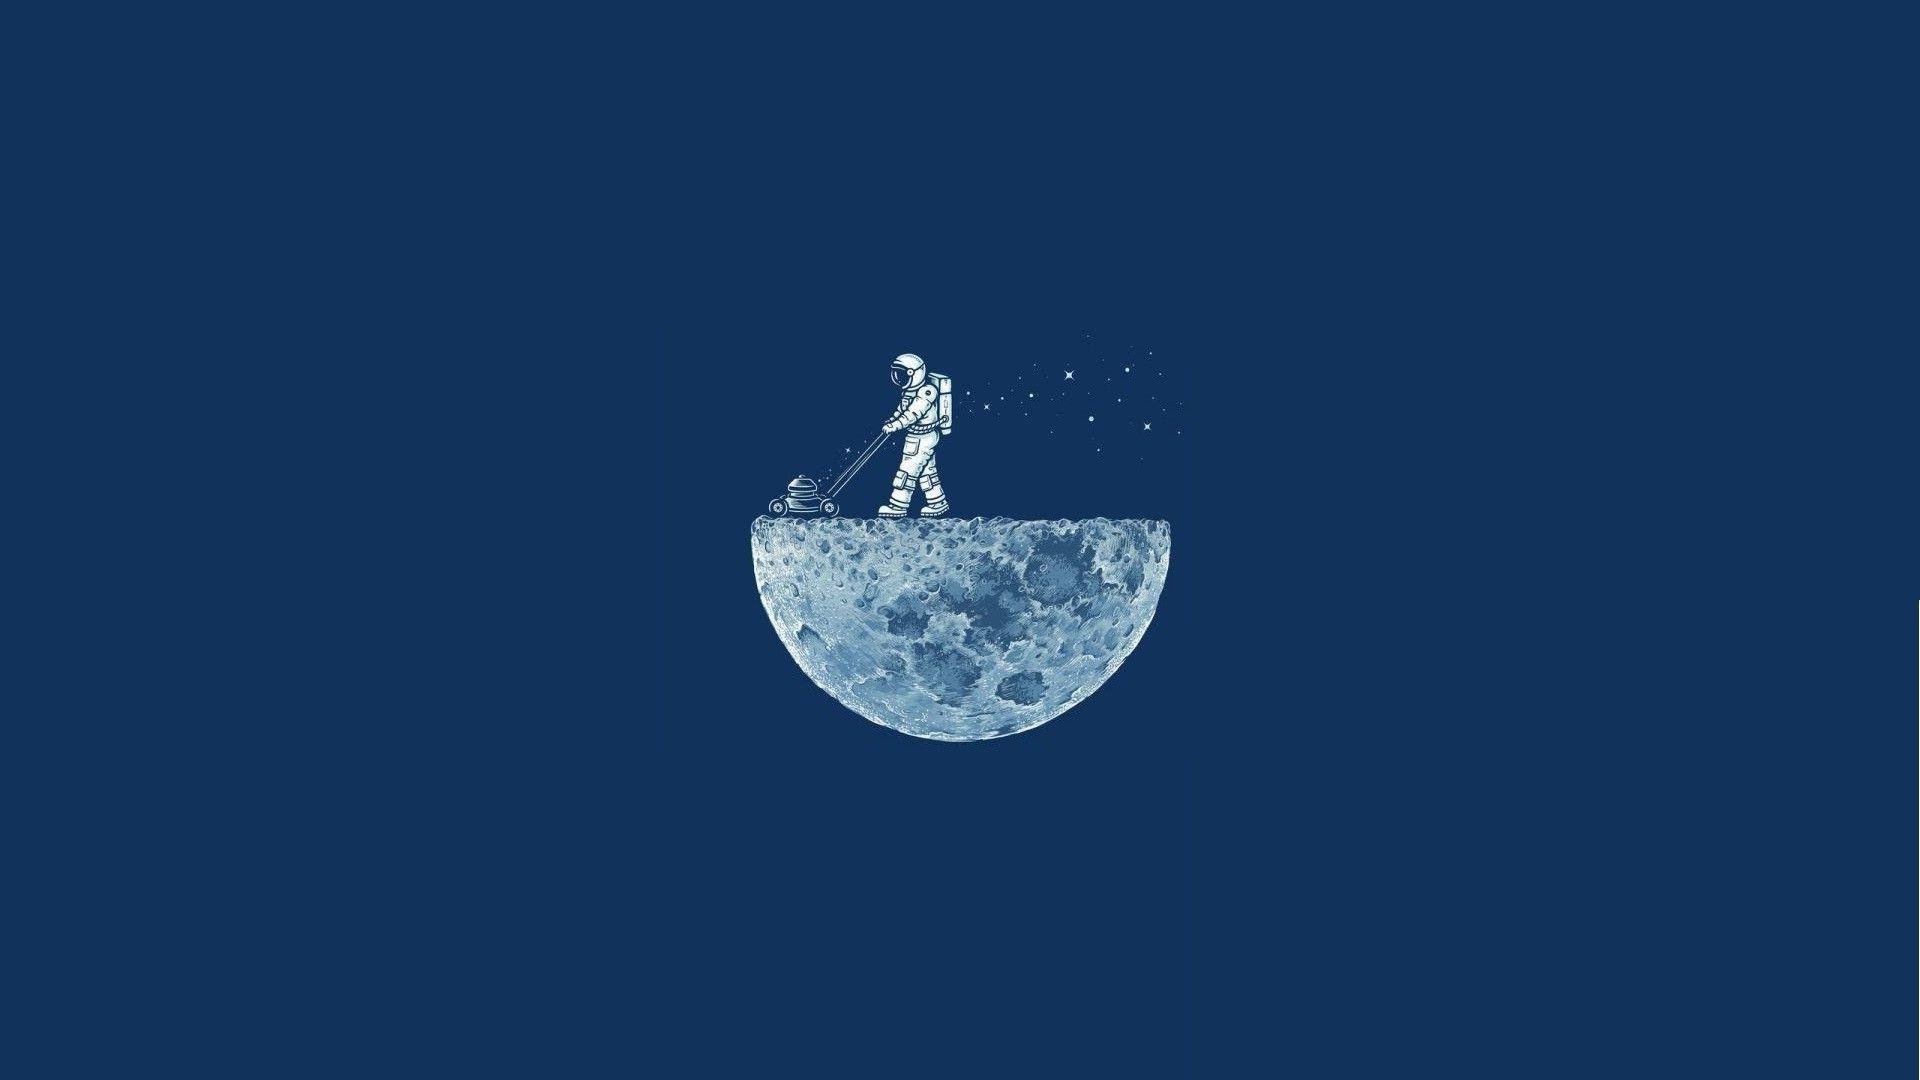 Space Minimalism Blue Background Moon Astronaut Astronauts